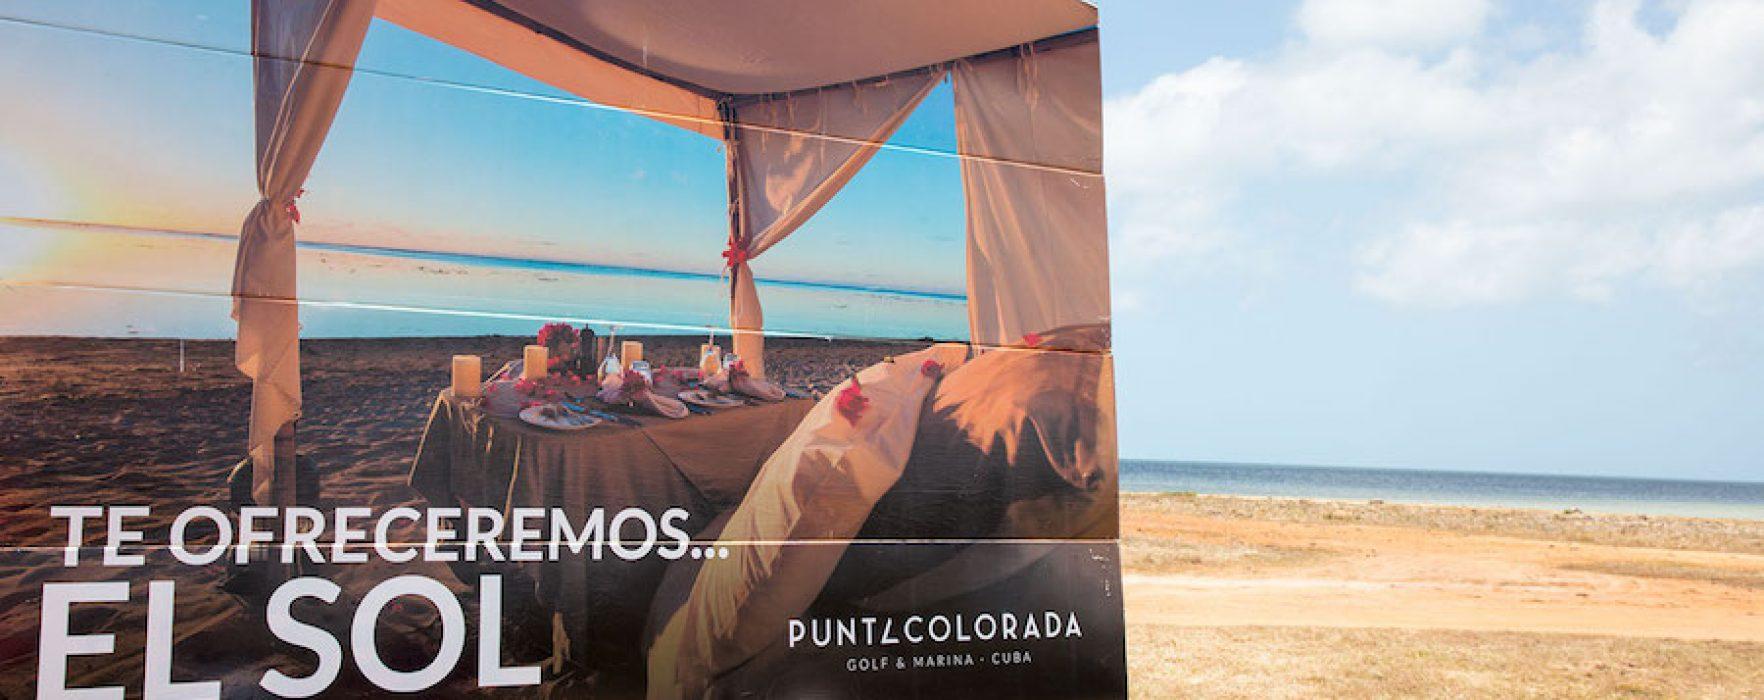 Inauguran valla promocional del proyecto Punta Colorada Golf & Marina Cuba *